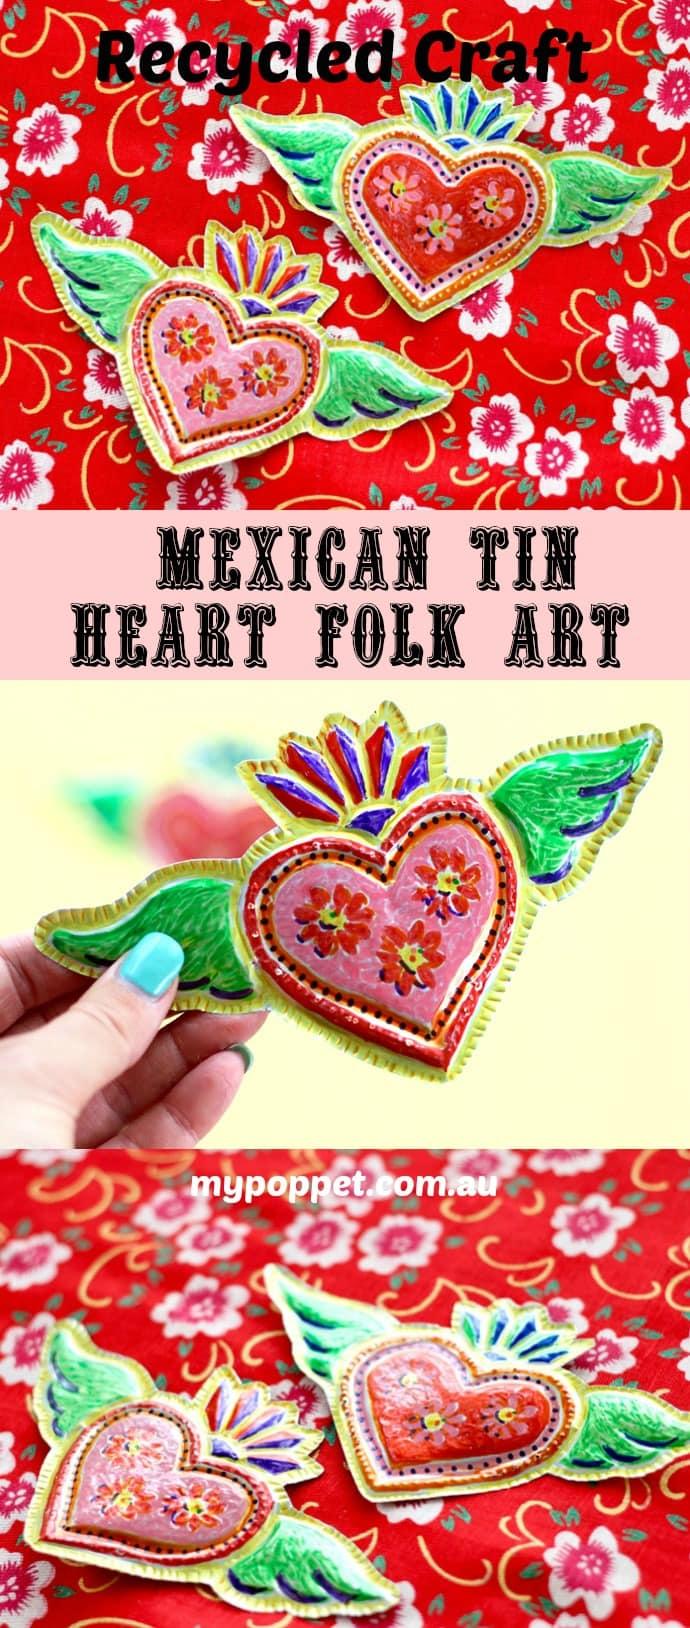 Recycled craft - Mexican Tin Heart Folk Art mypoppet.com.au